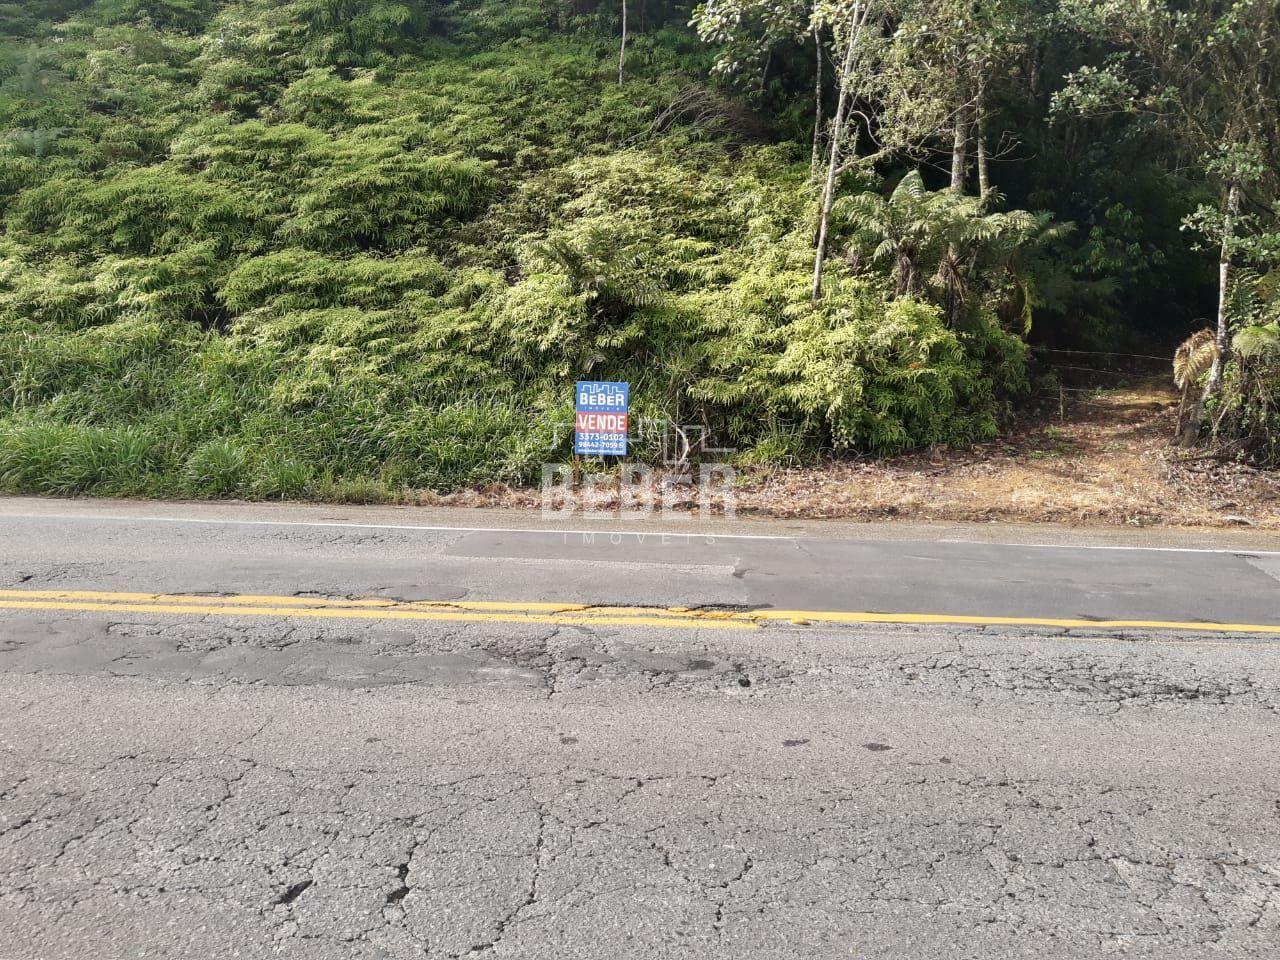 Terreno/Lote à venda  no Rio Branco - Guaramirim, SC. Imóveis